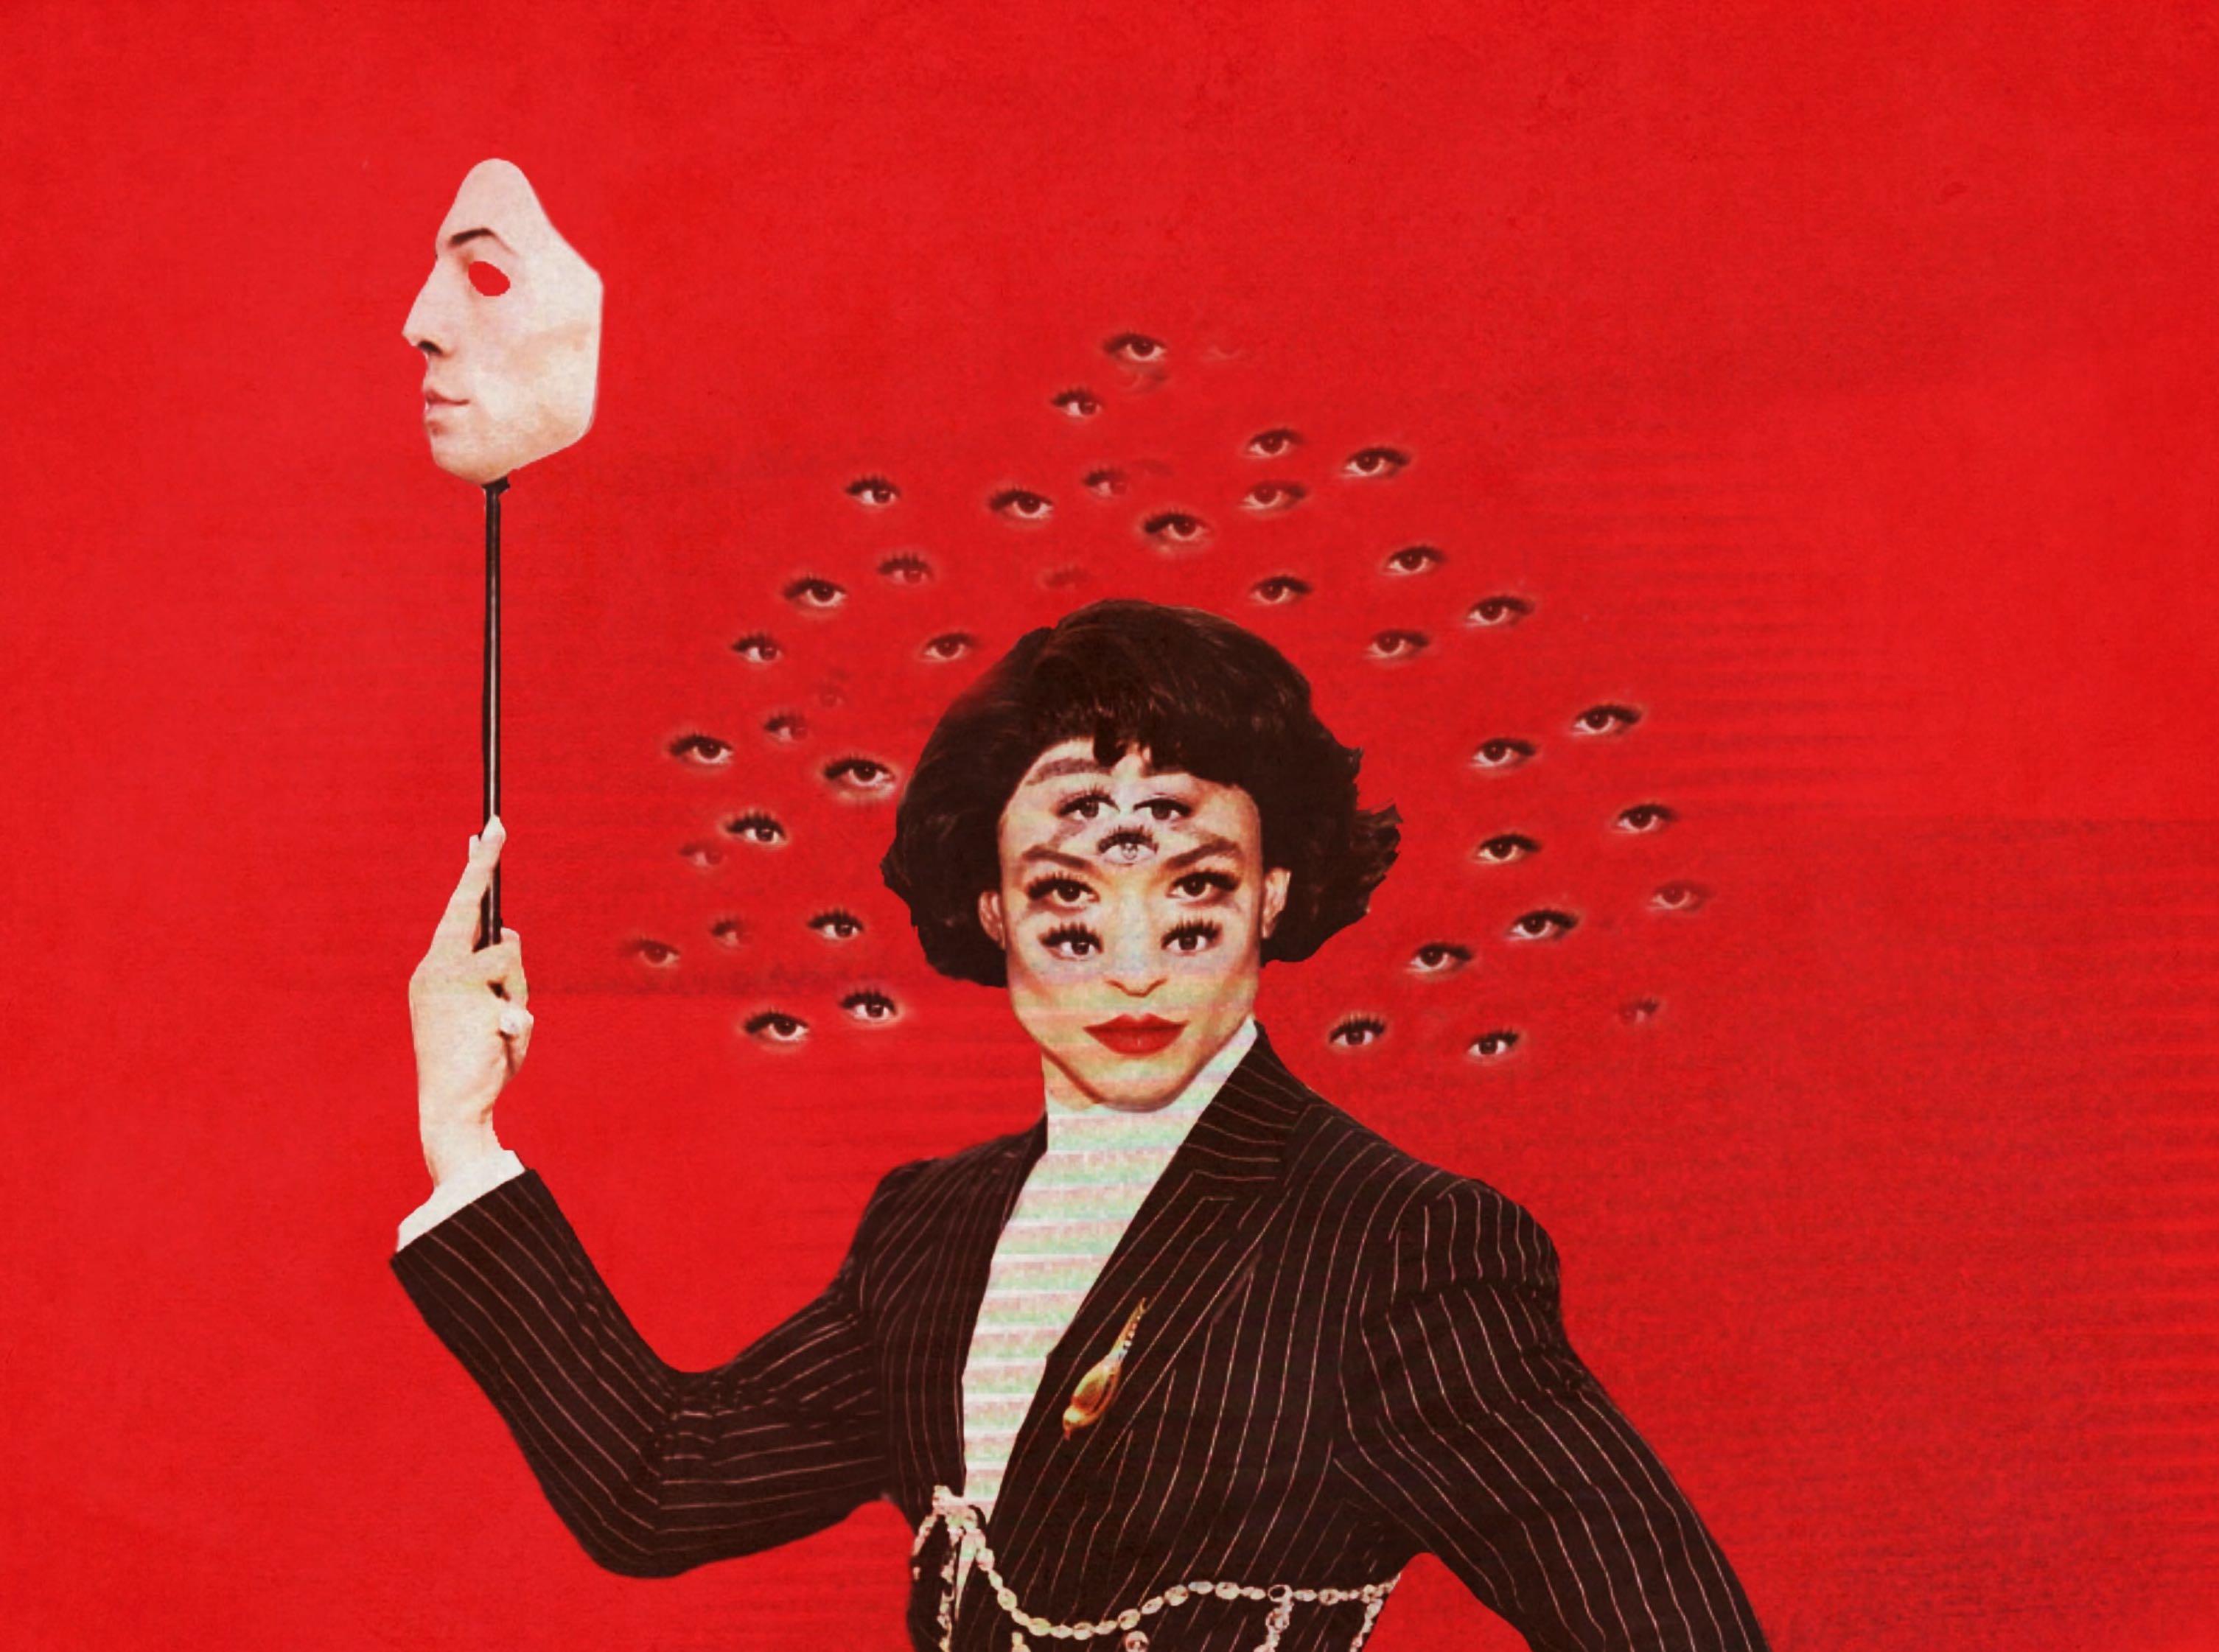 met gala riverdale cole sprouse lili reinhart starwars fashion harry potter bughead fan art twitch